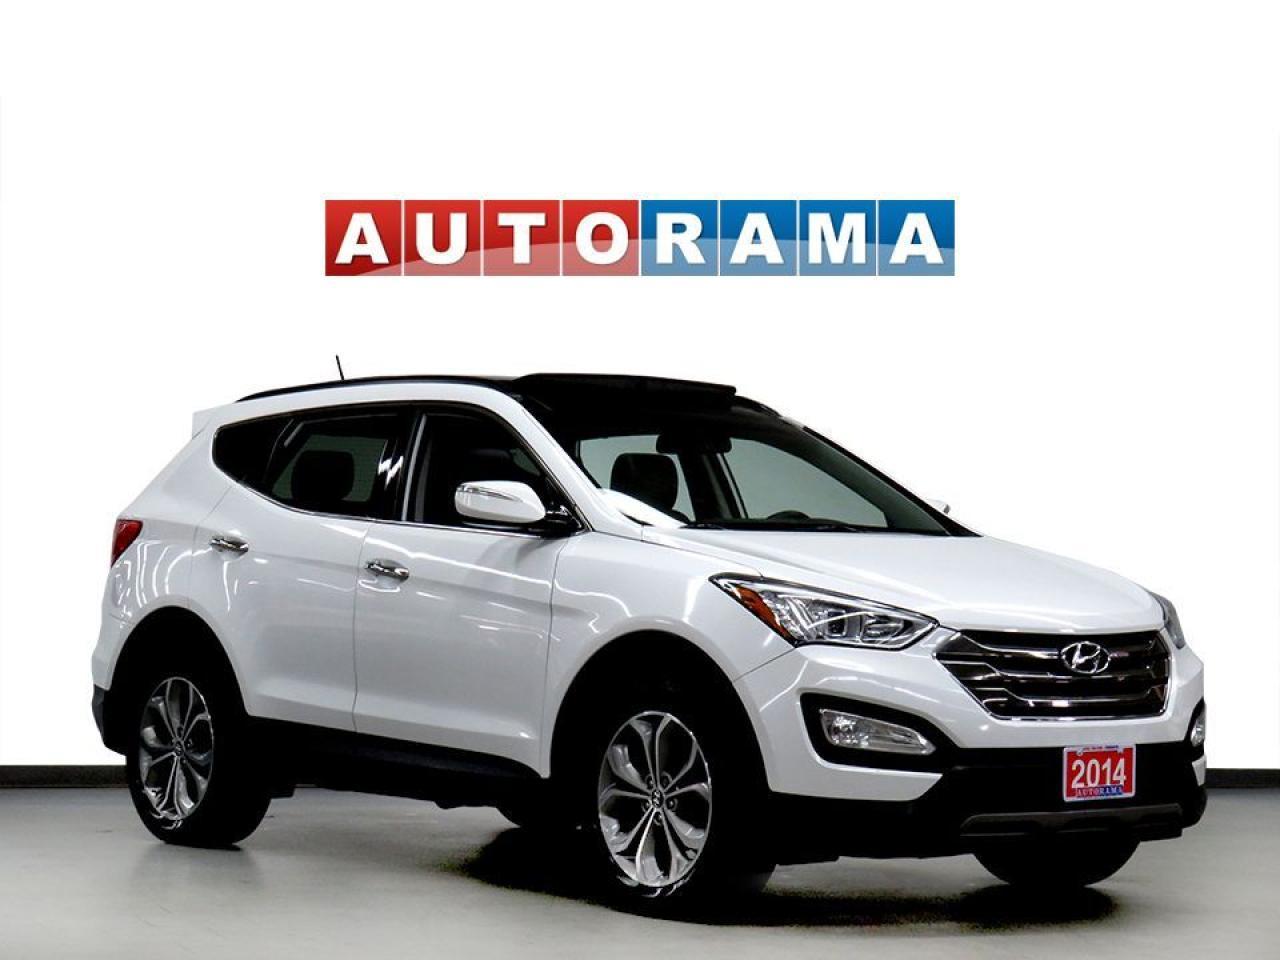 2014 Hyundai Santa Fe SPORT LEATHER PANORAMIC SUNROOF AWD BACK UP CAMERA